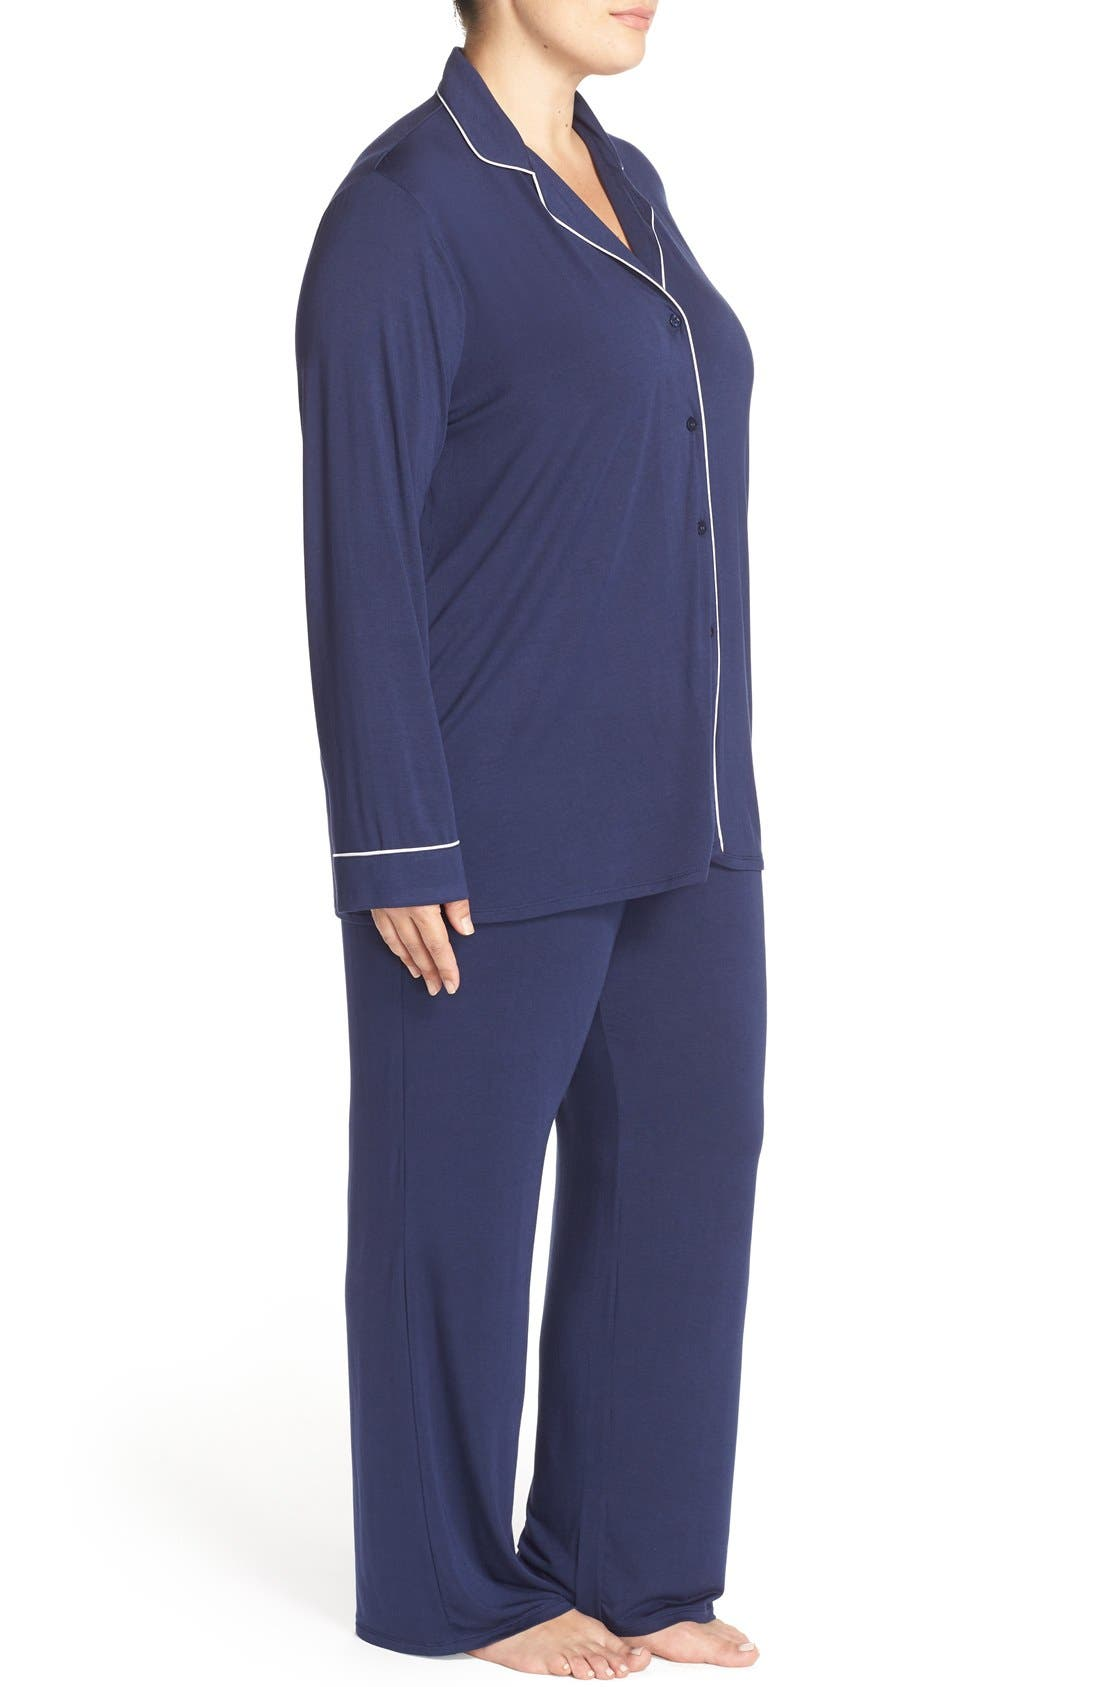 'Moonlight' Pajamas,                             Alternate thumbnail 3, color,                             Navy Peacoat